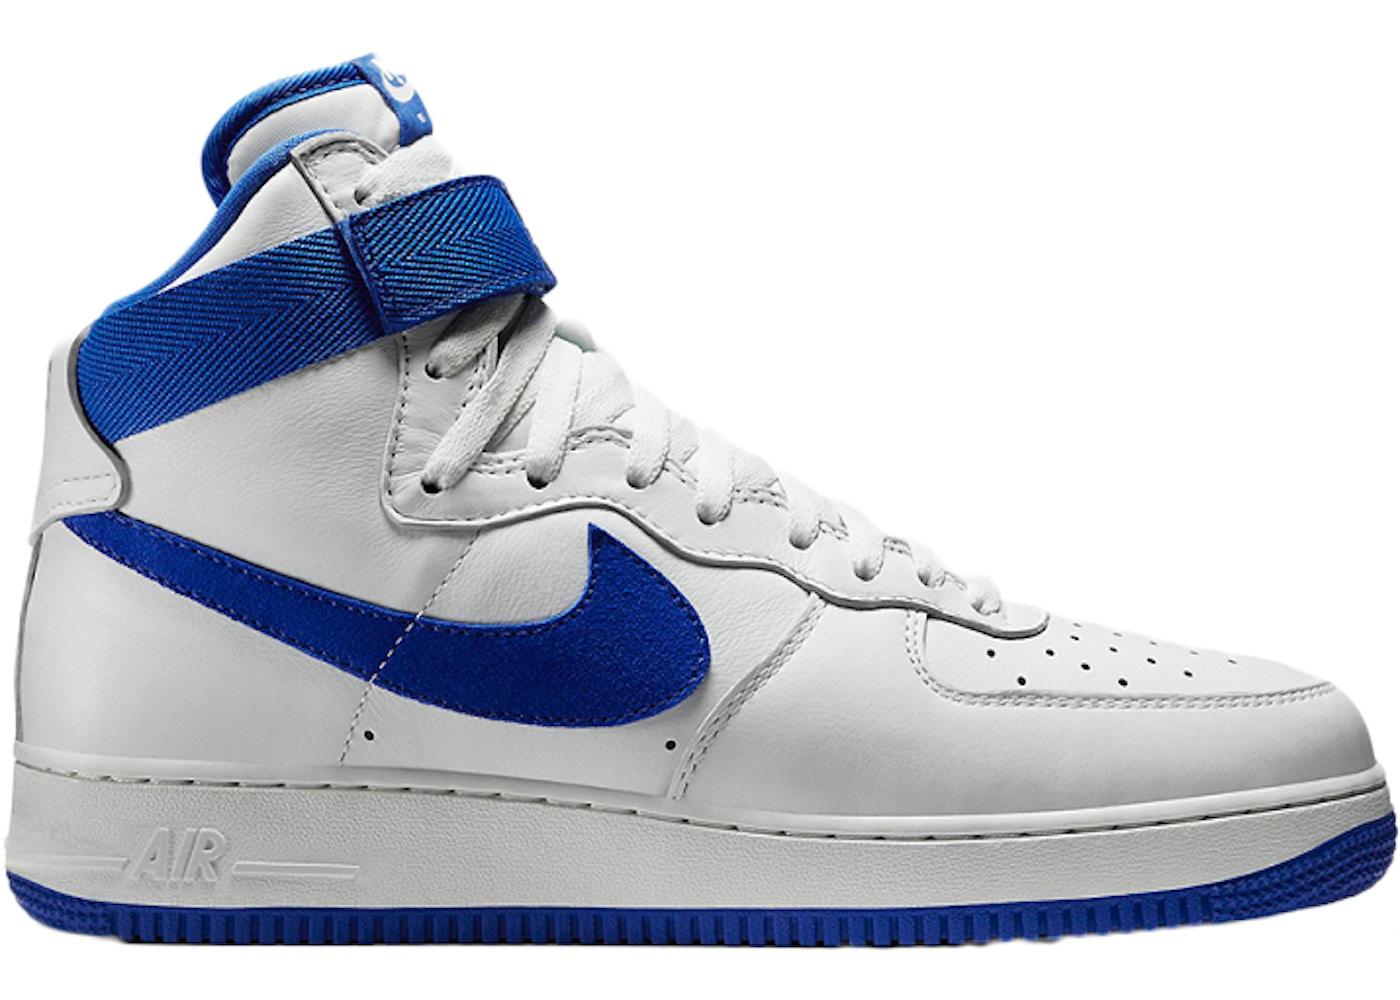 Nike Air Force 1 High White Game Royal 743546 103